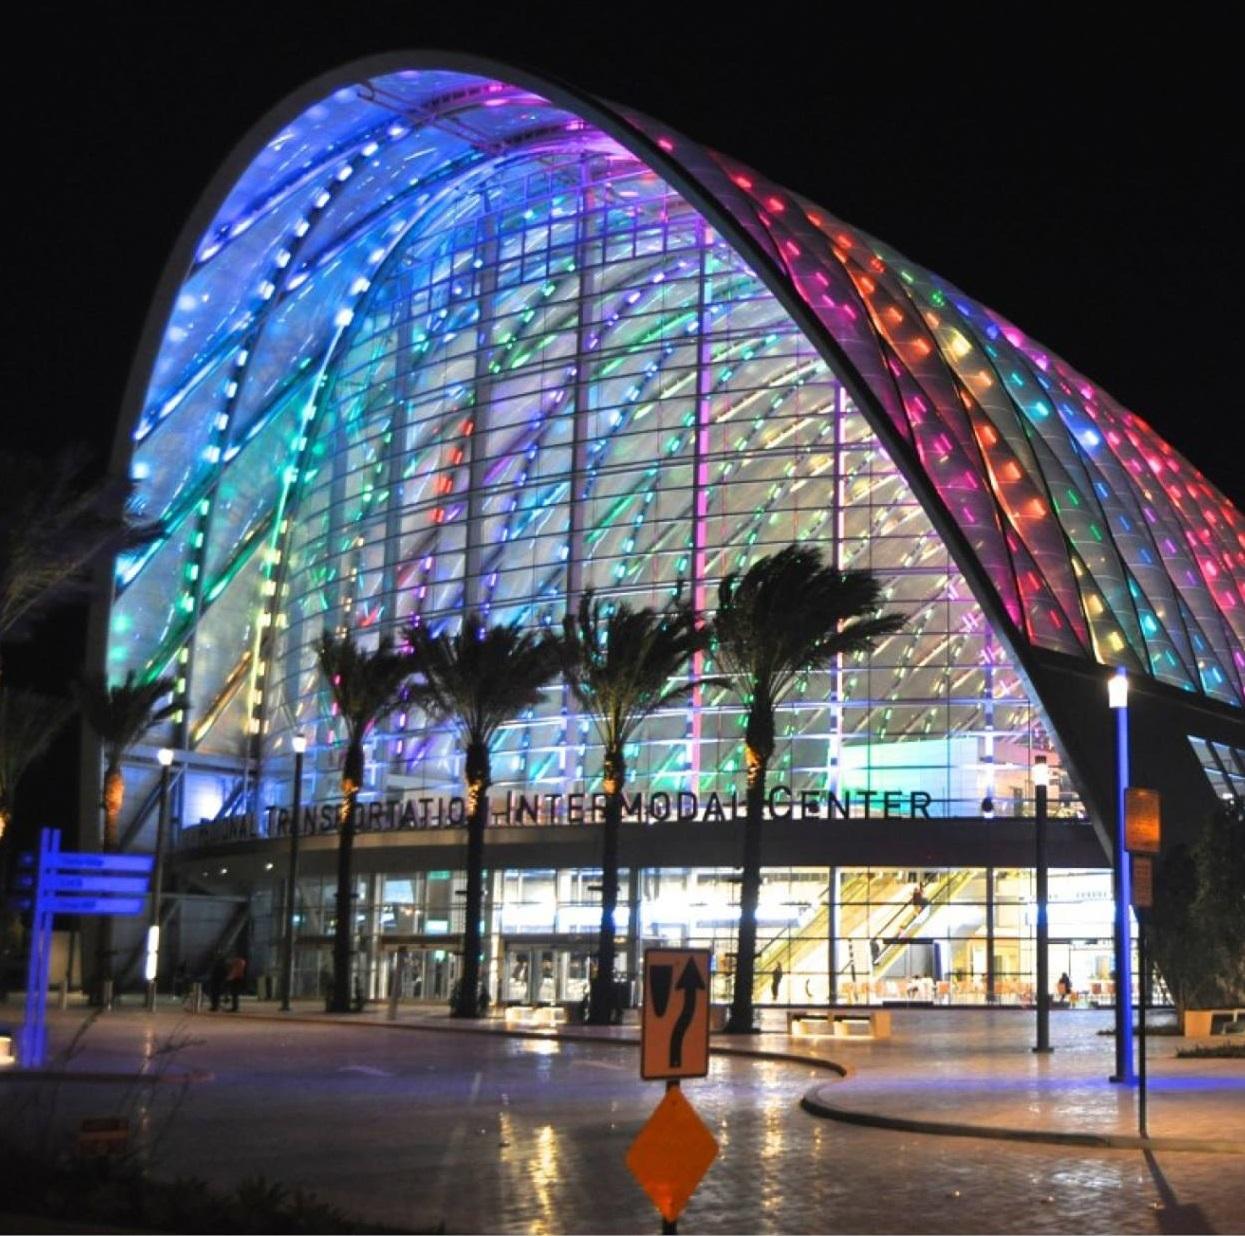 lighting stores in las vegas. Helix Electric Coupons Near Me In Las Vegas : 8coupons Lighting Stores D